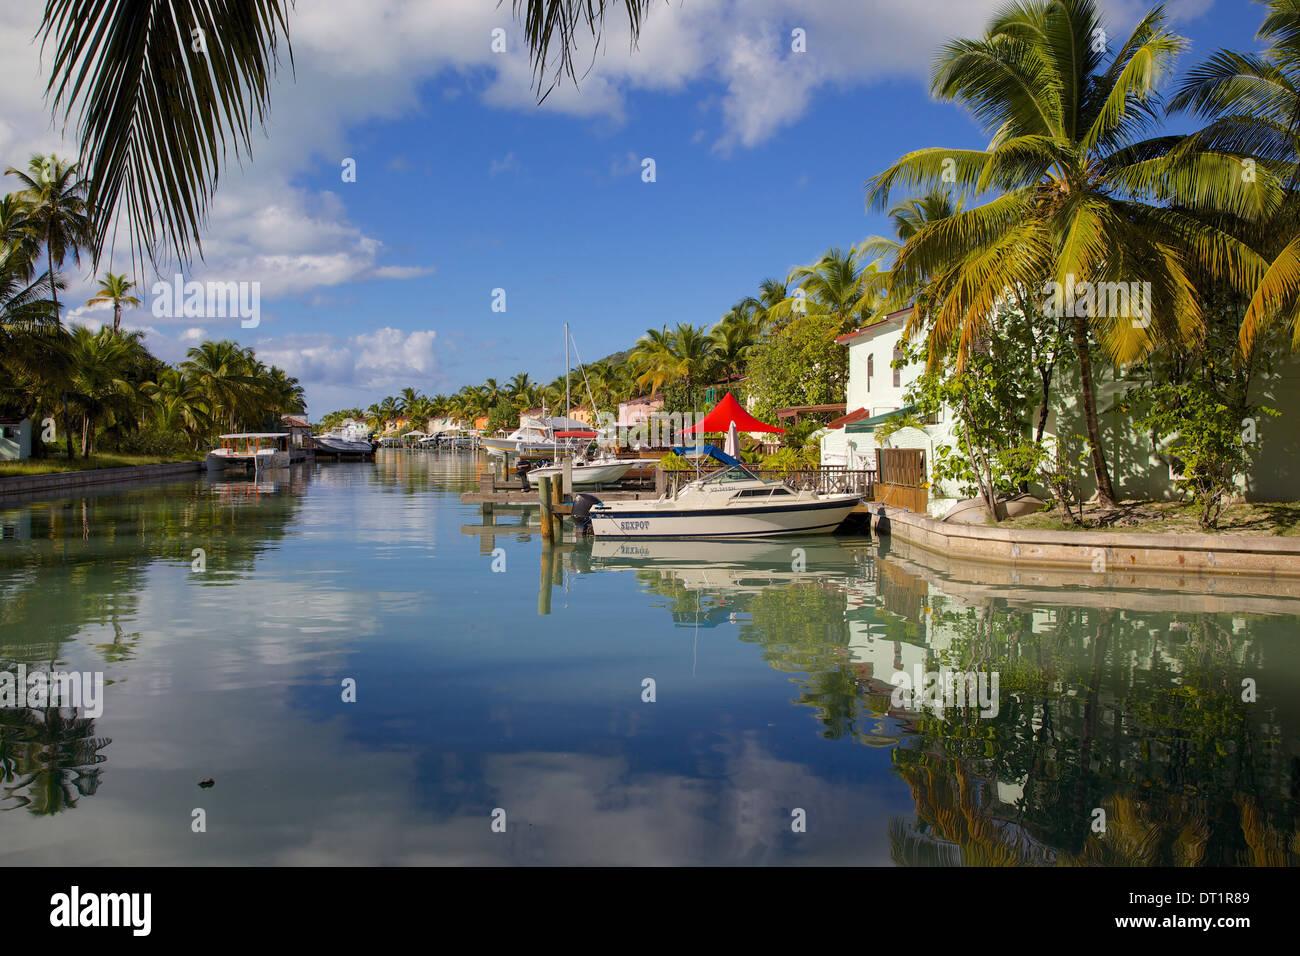 Marina, Jolly Harbour, St. Mary, Antigua, Leeward Islands, West Indies, Caribbean, Central America - Stock Image